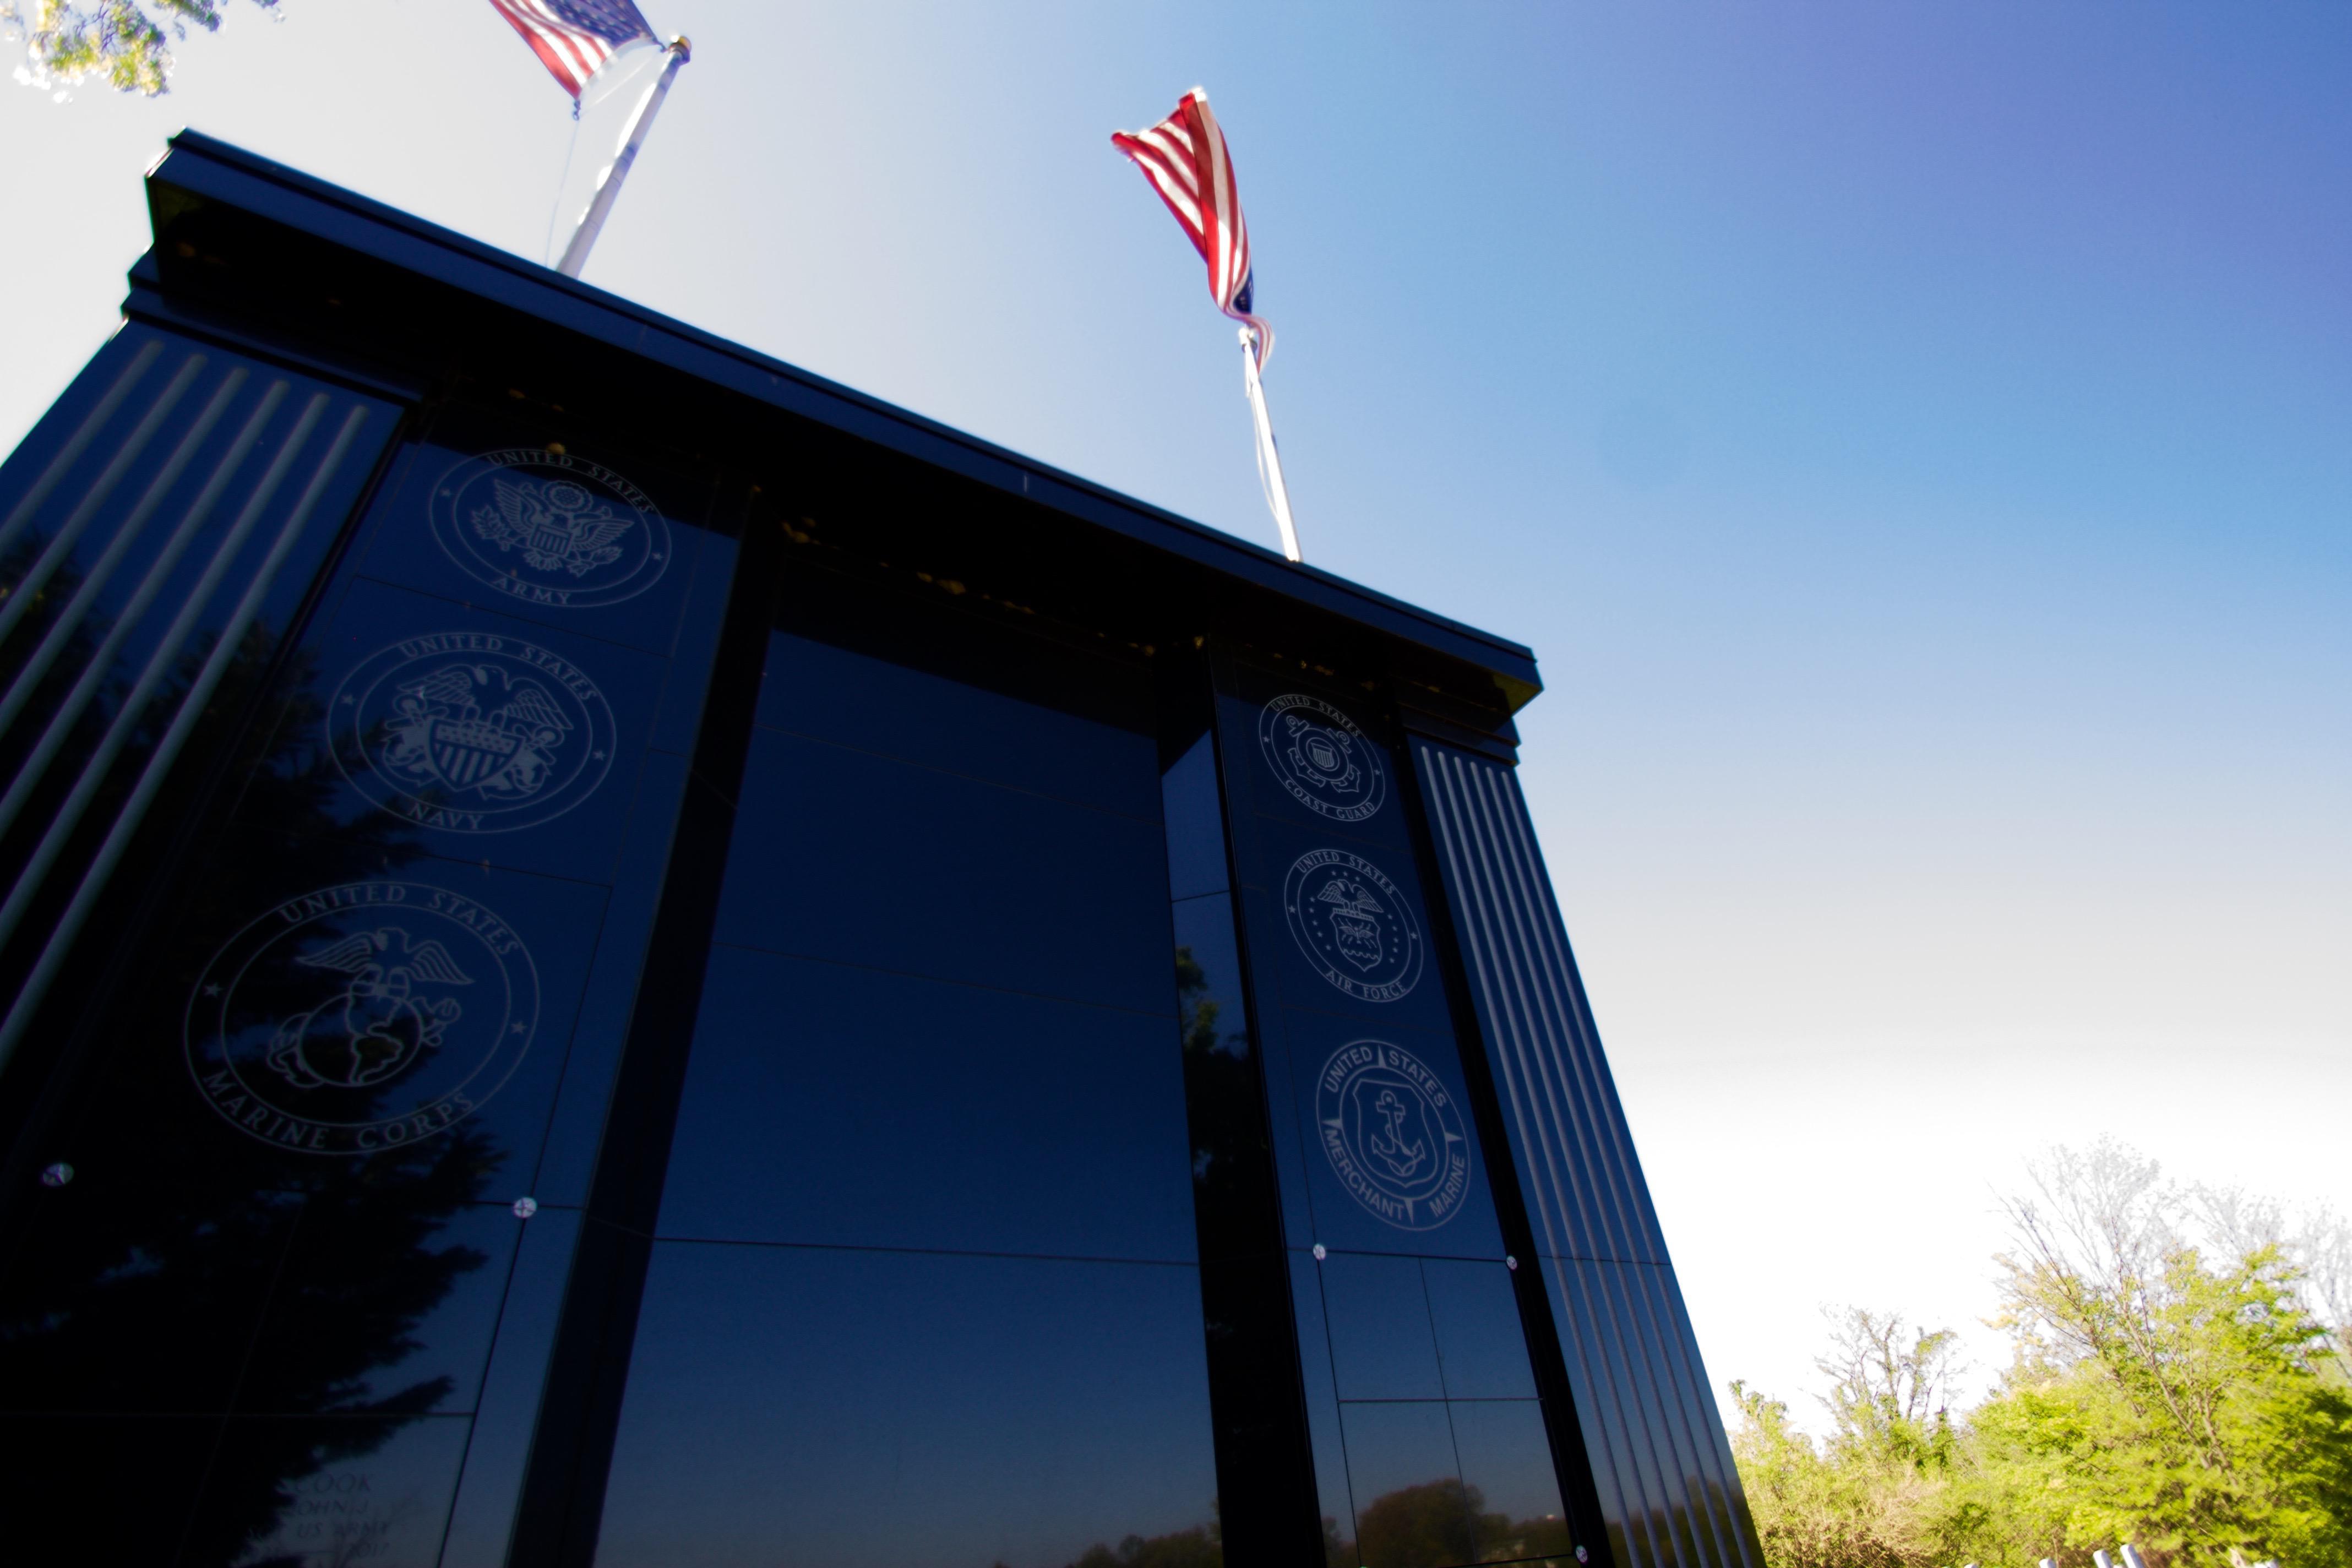 Camden County Veterans Cemetery image 6